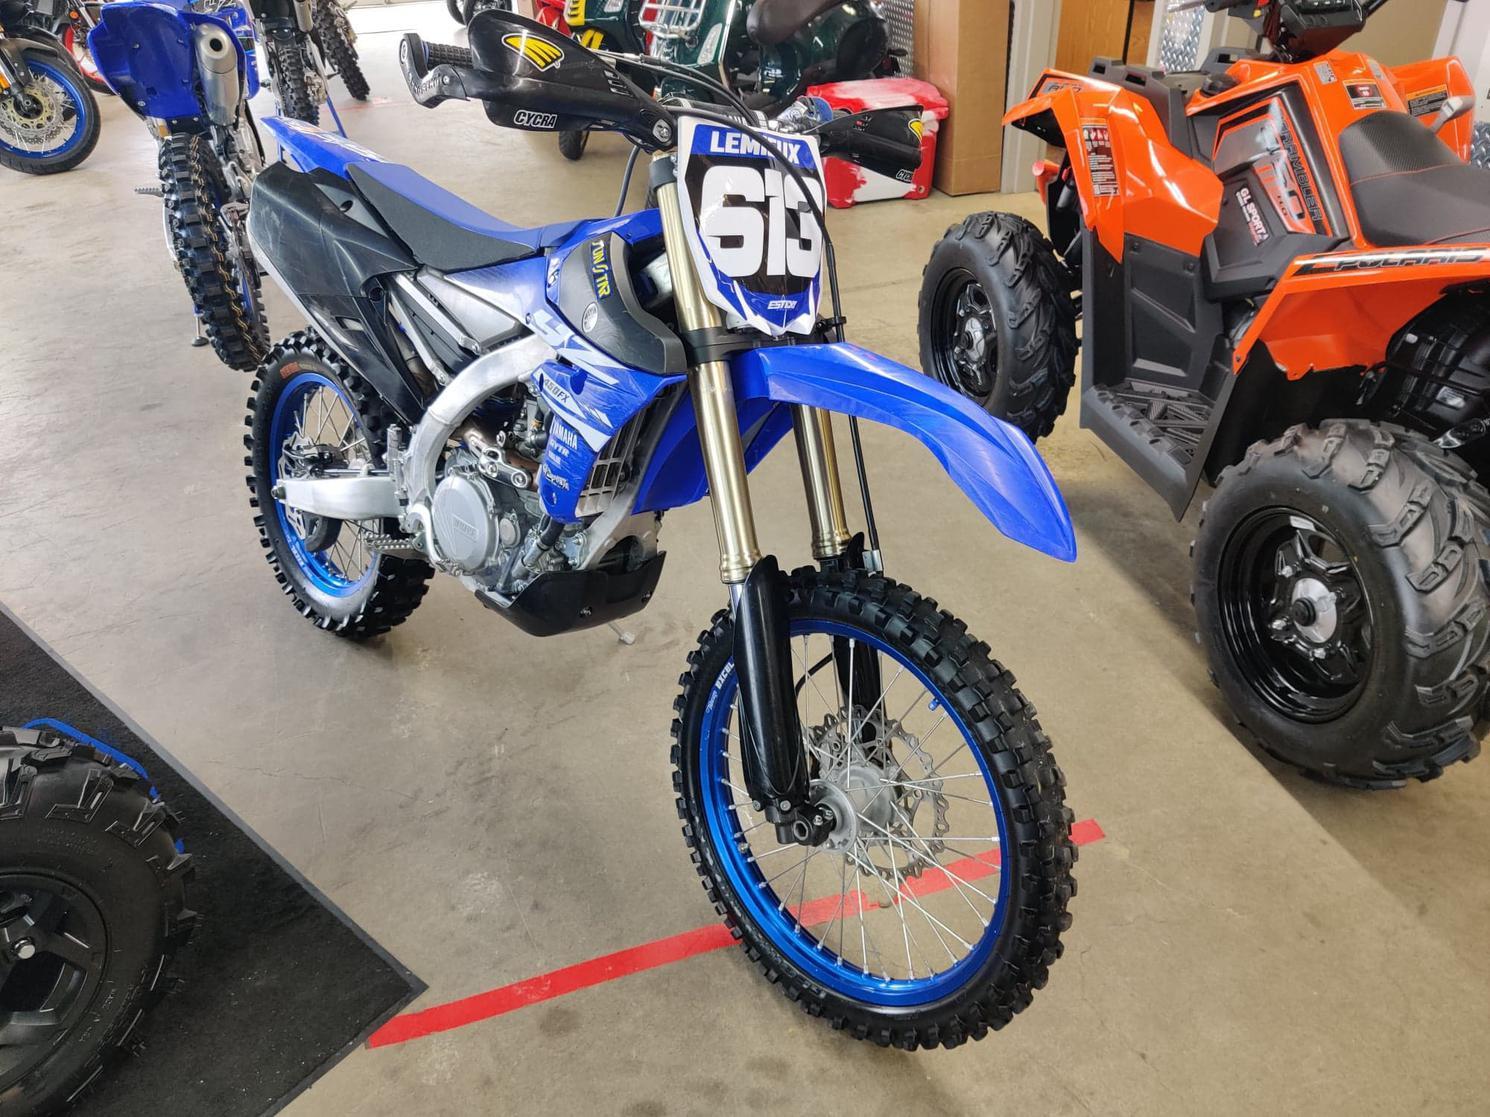 2018 Yamaha YZ 450 FX